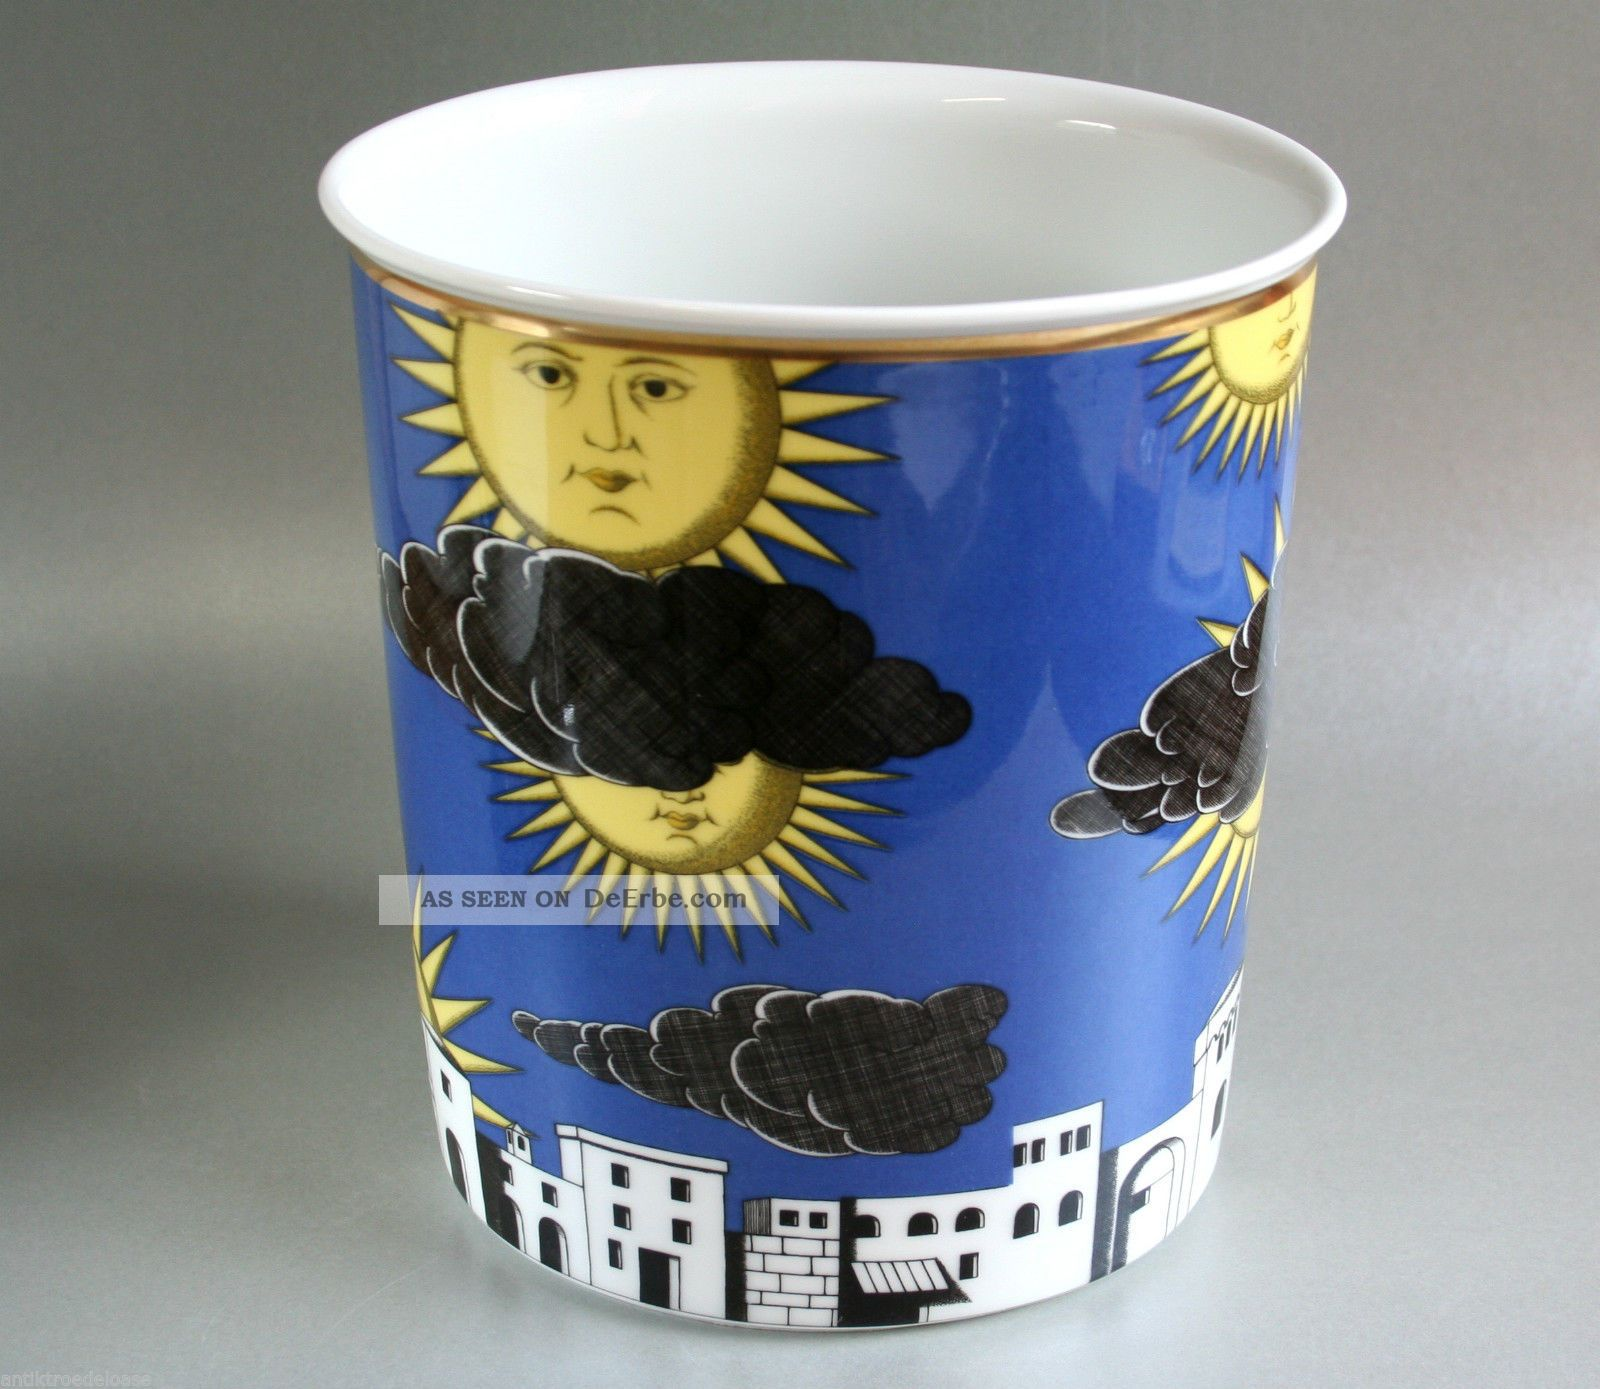 Fornasetti Für Rosenthal Porzellan Vase - Il Sole Di Capri - H:20cm Top Design Nach Marke & Herkunft Bild